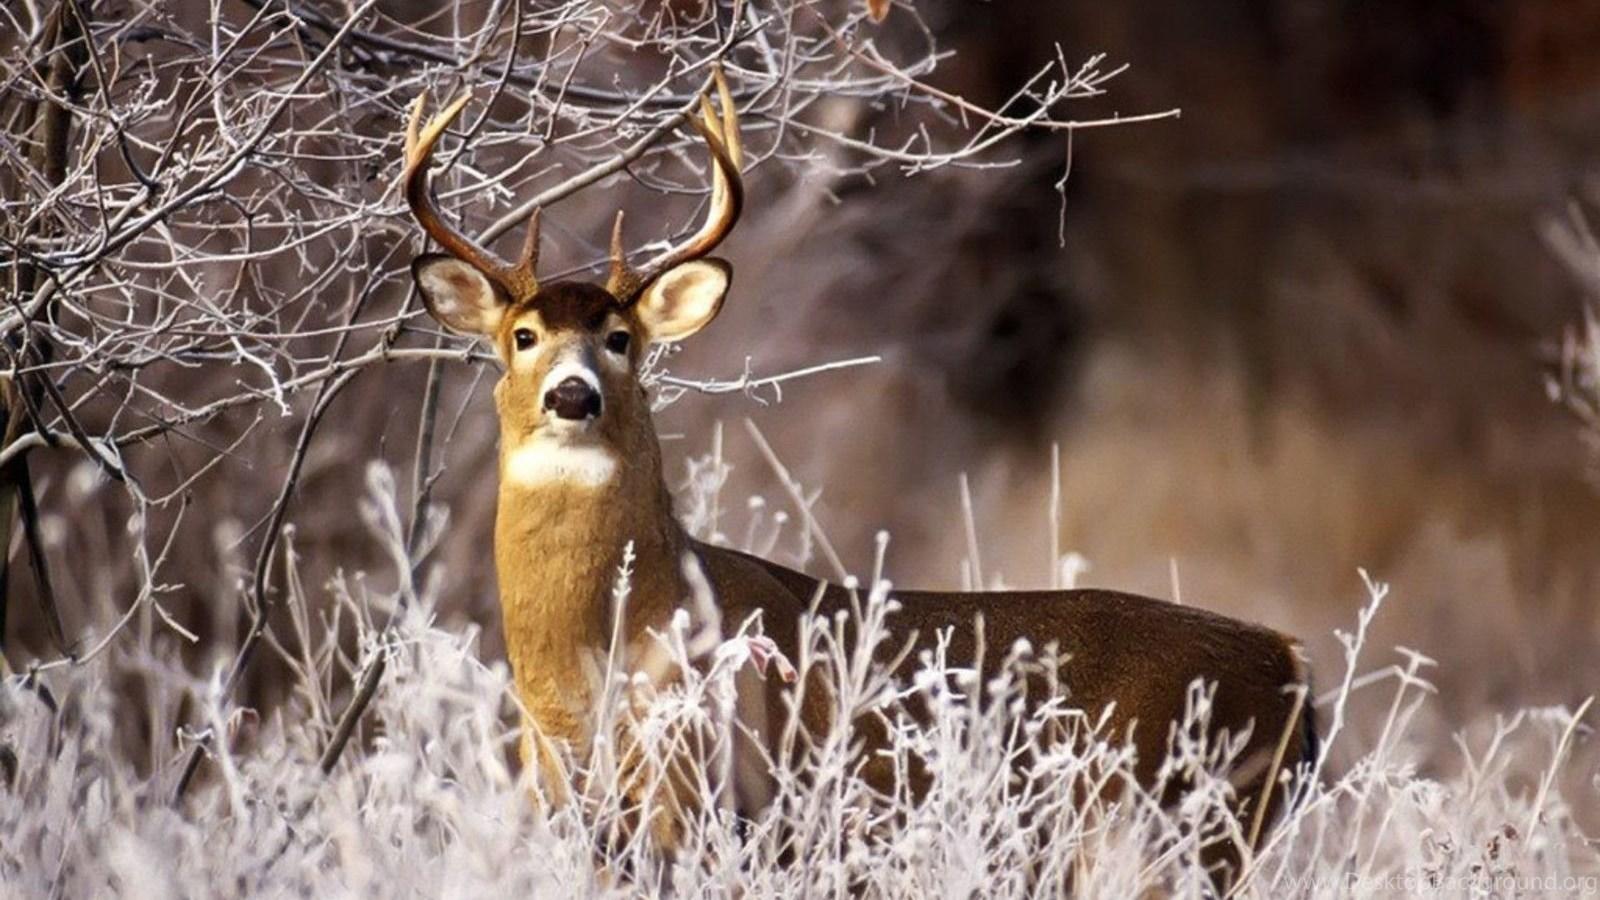 Deer Hunting Wallpapers For Computer Wallpapers Cave Desktop Background